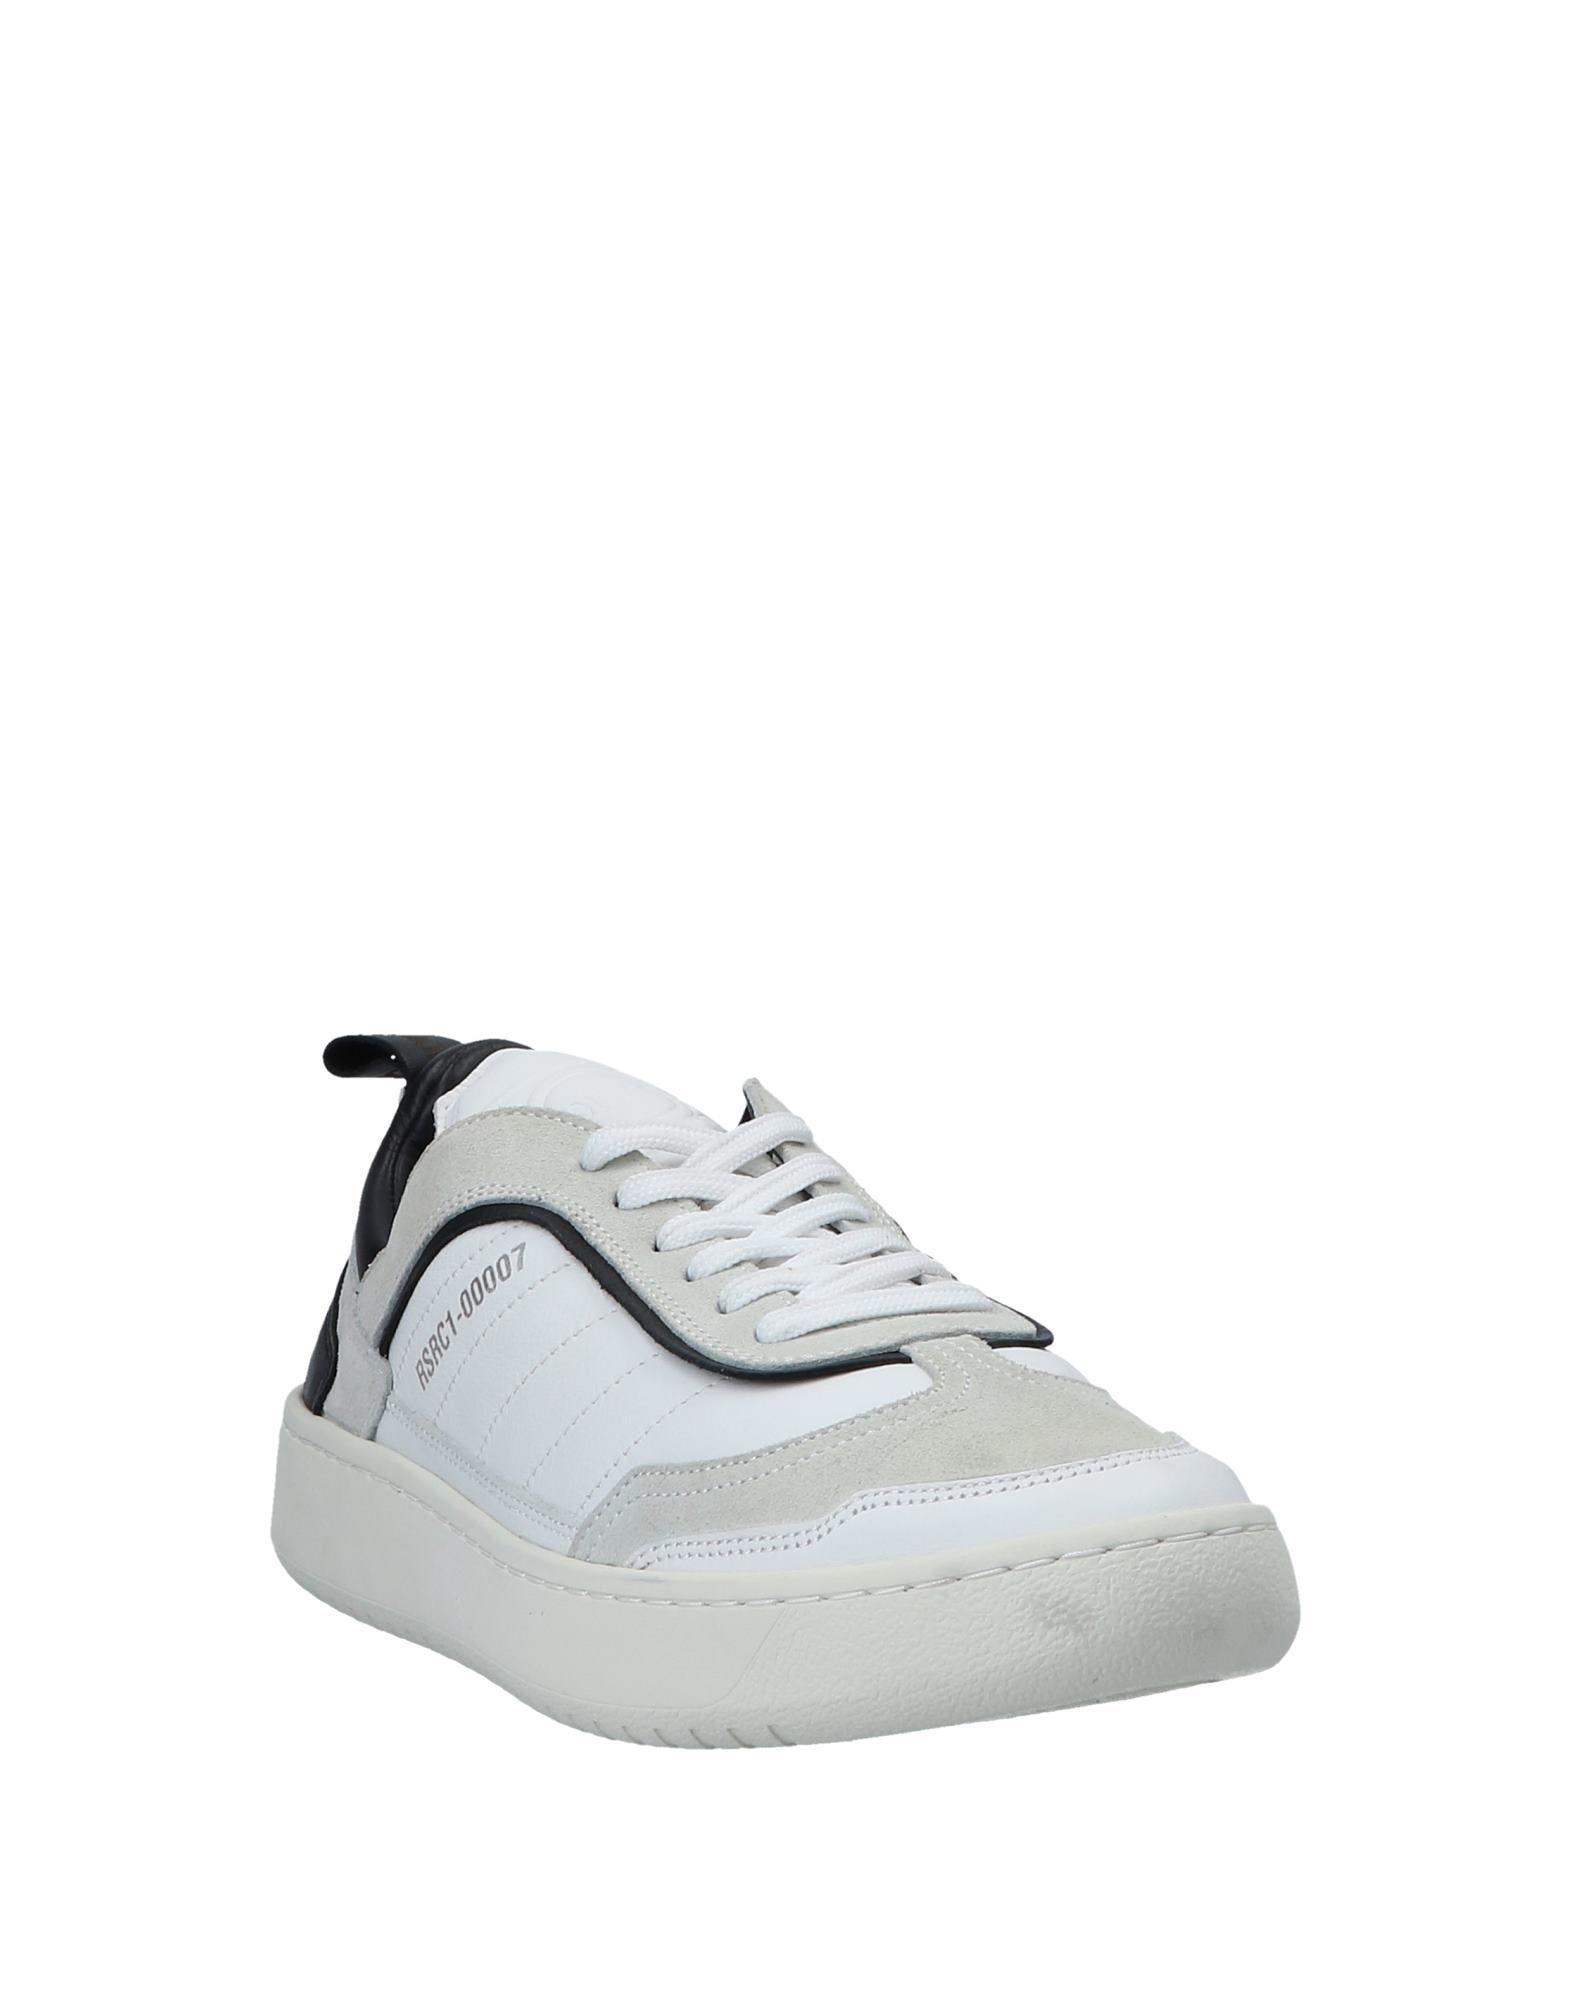 Rabatt echte echte echte Schuhe Colmar Sneakers Herren  11552894AV 6a6e41